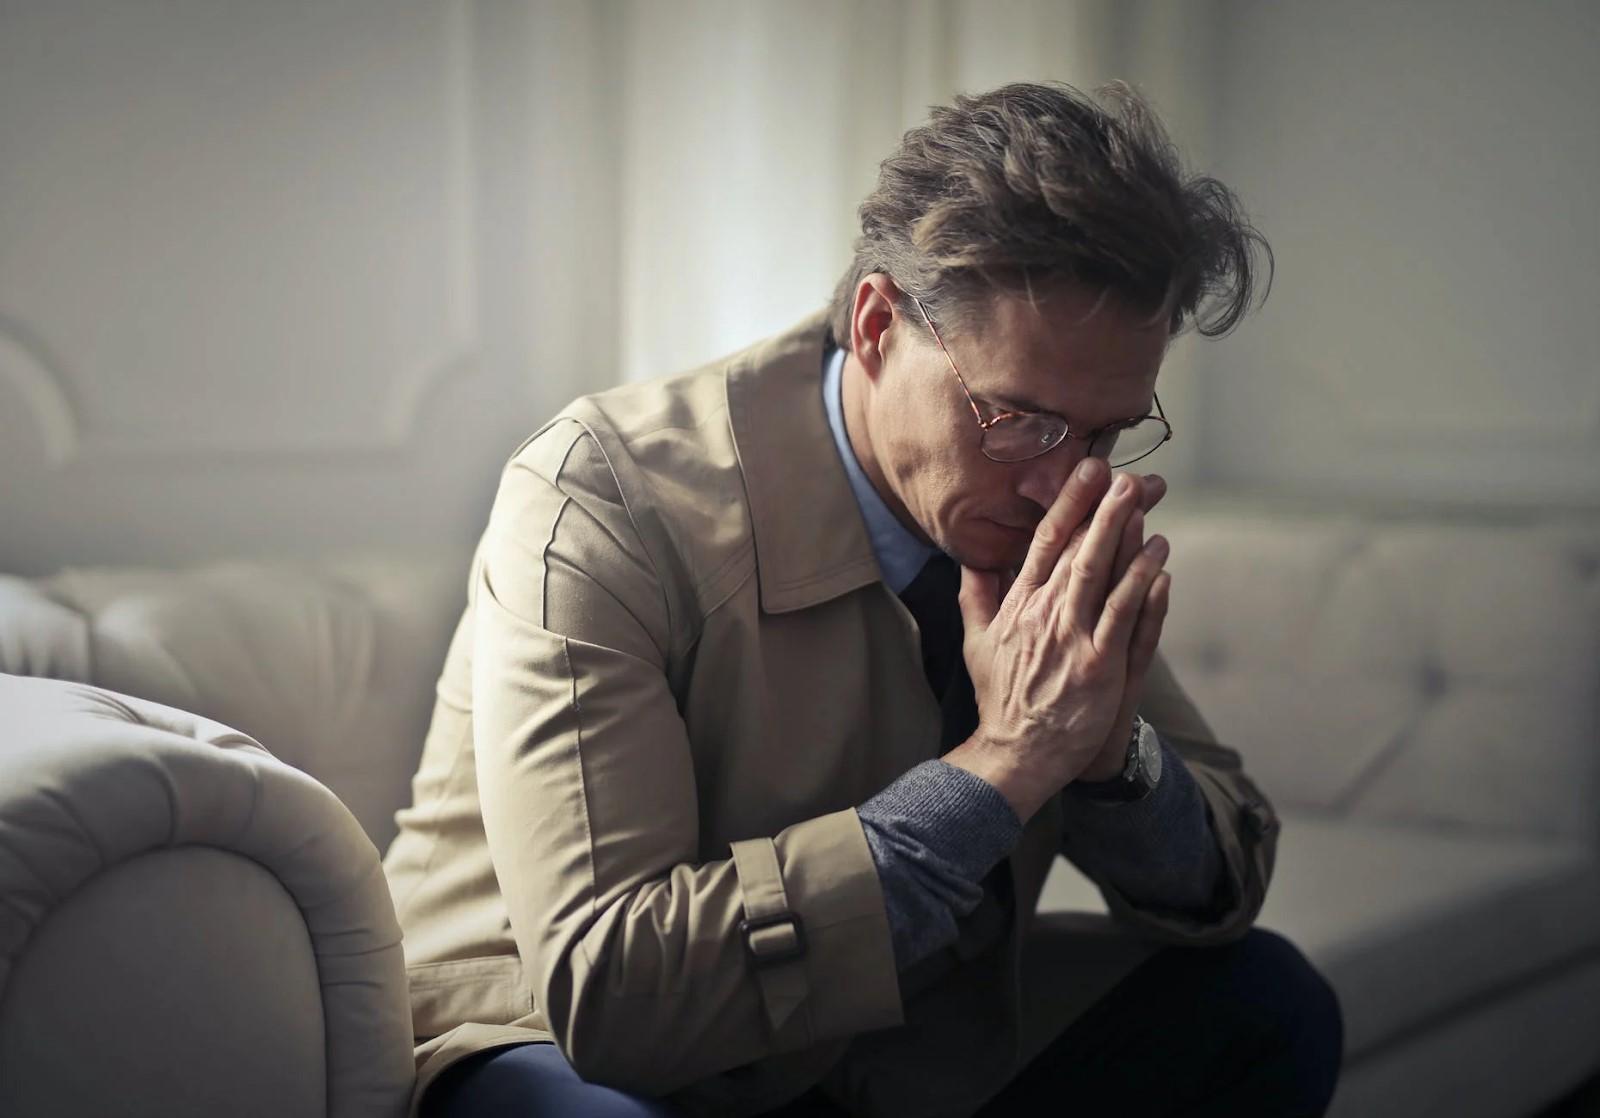 sad man-overwhelmed-sad-depressed-worry